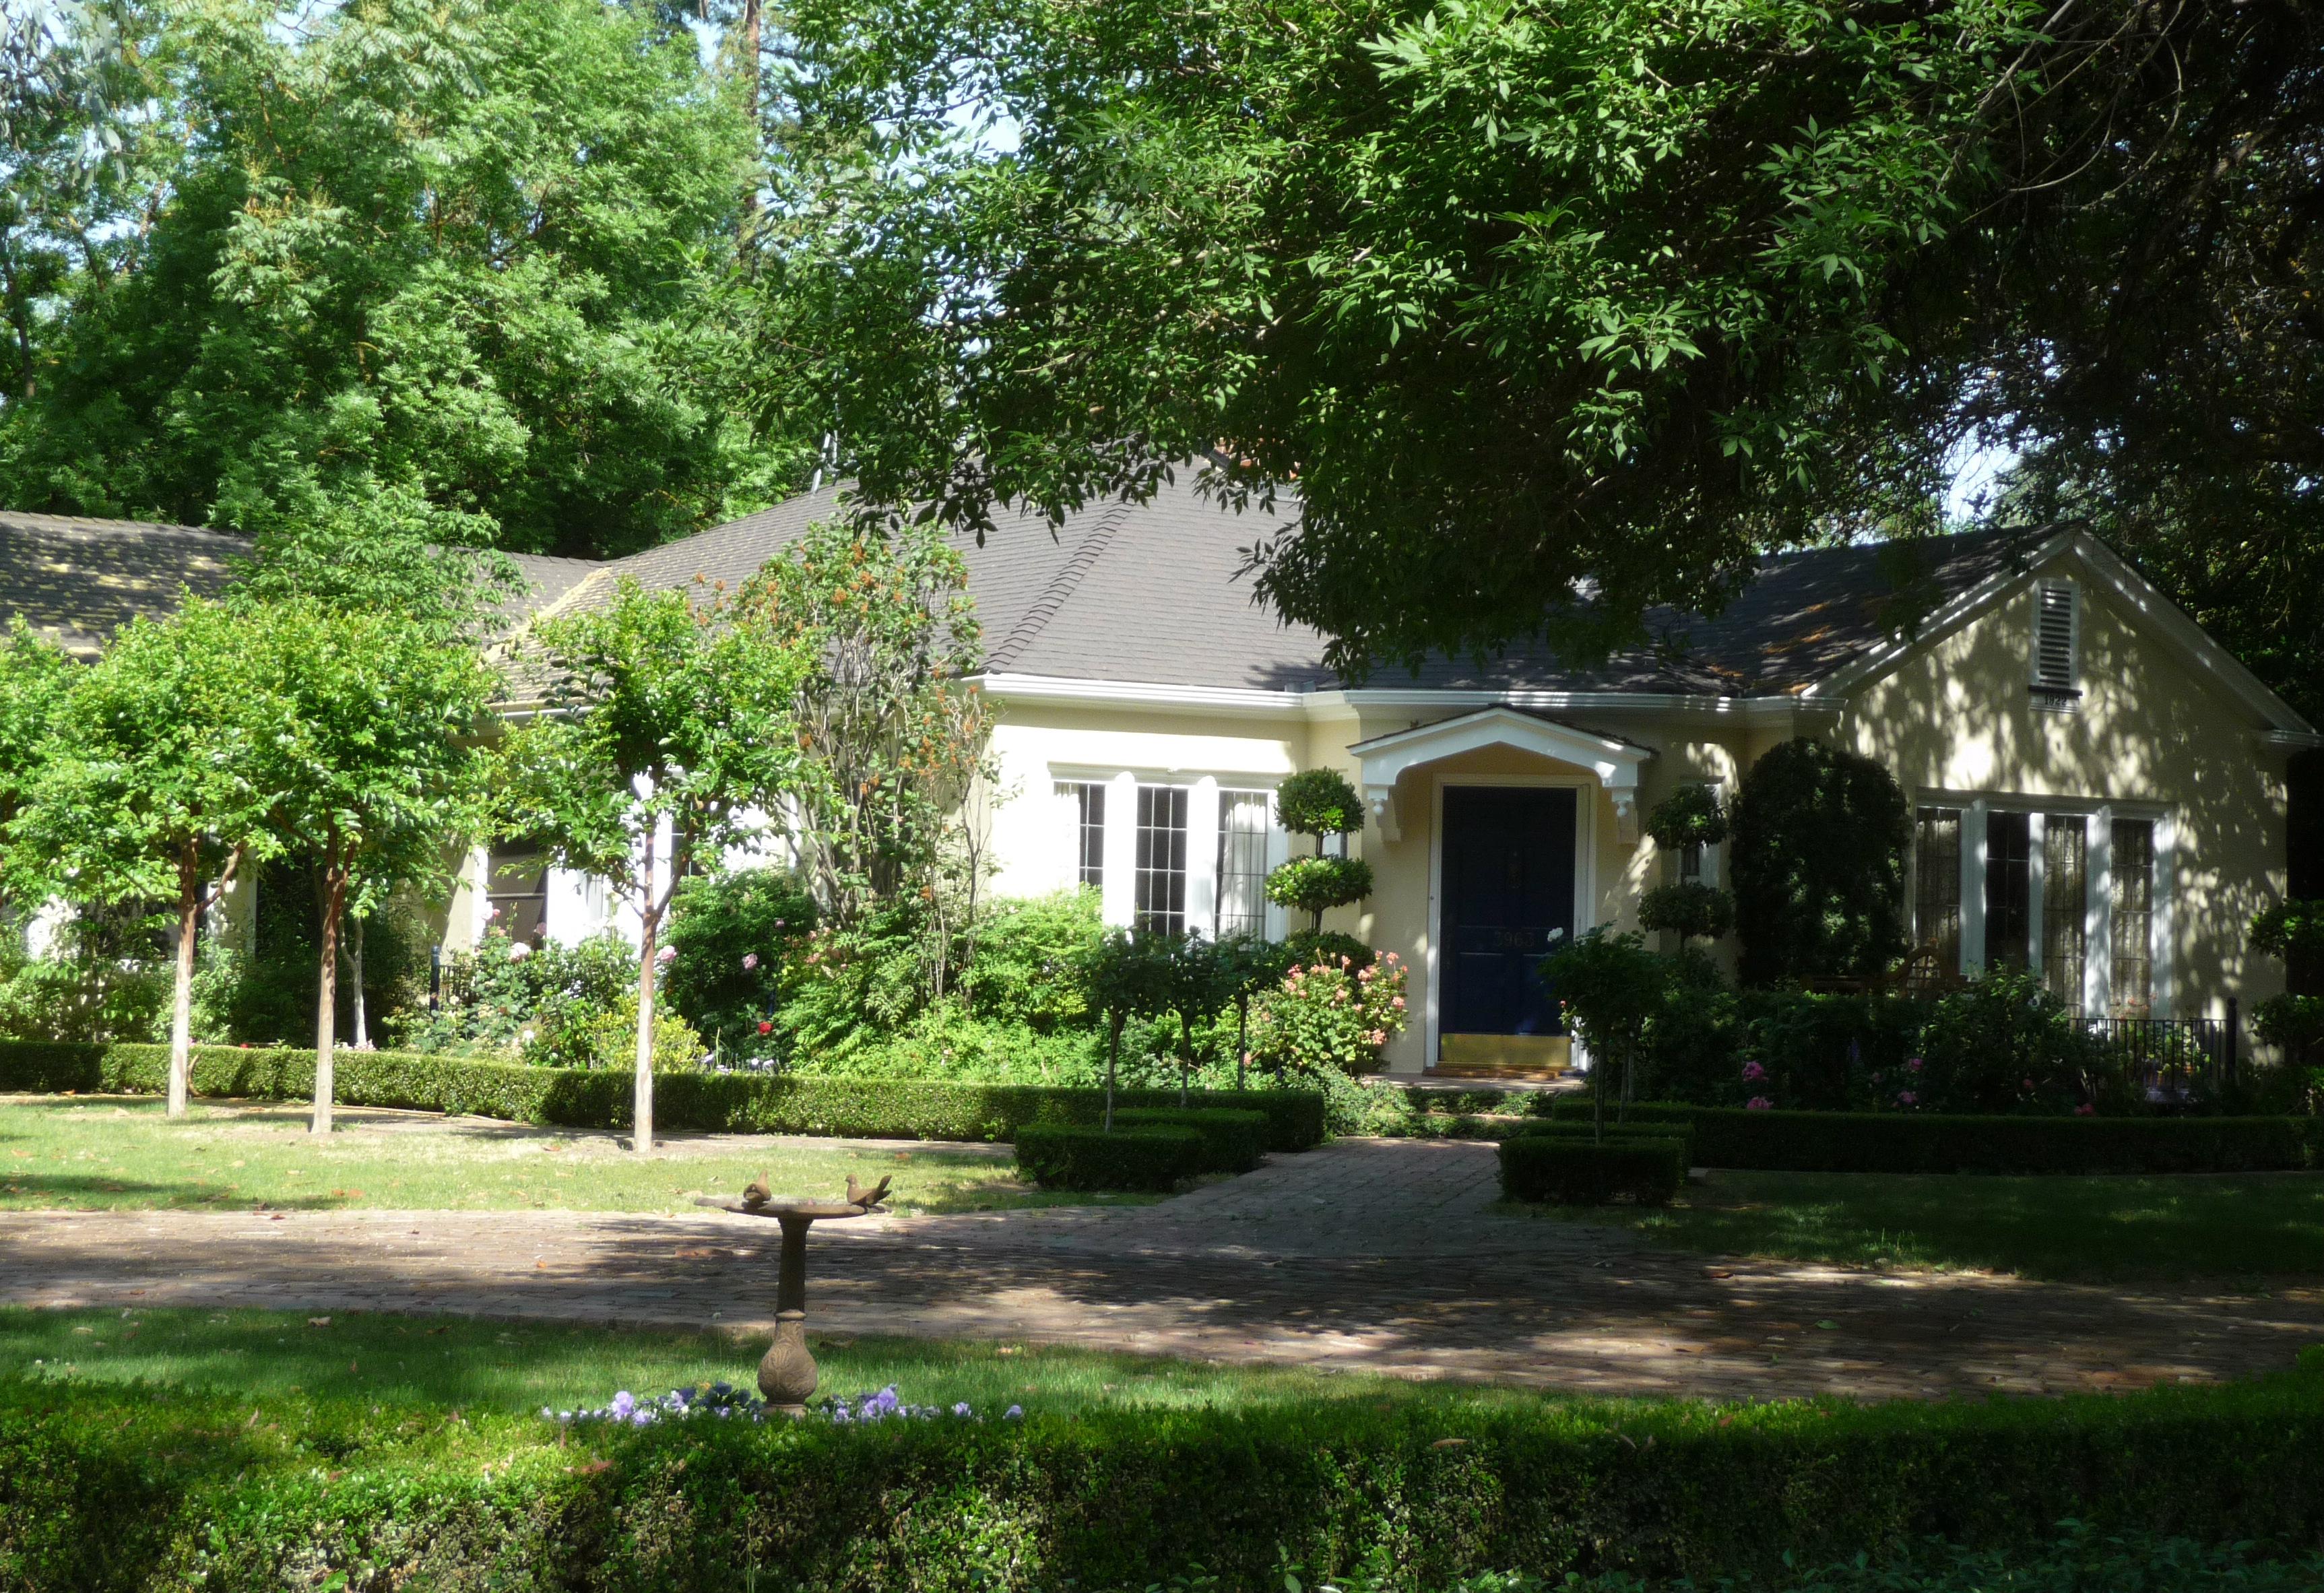 Fresno Fig Garden Homes For Sale Fresno Fig Garden Real